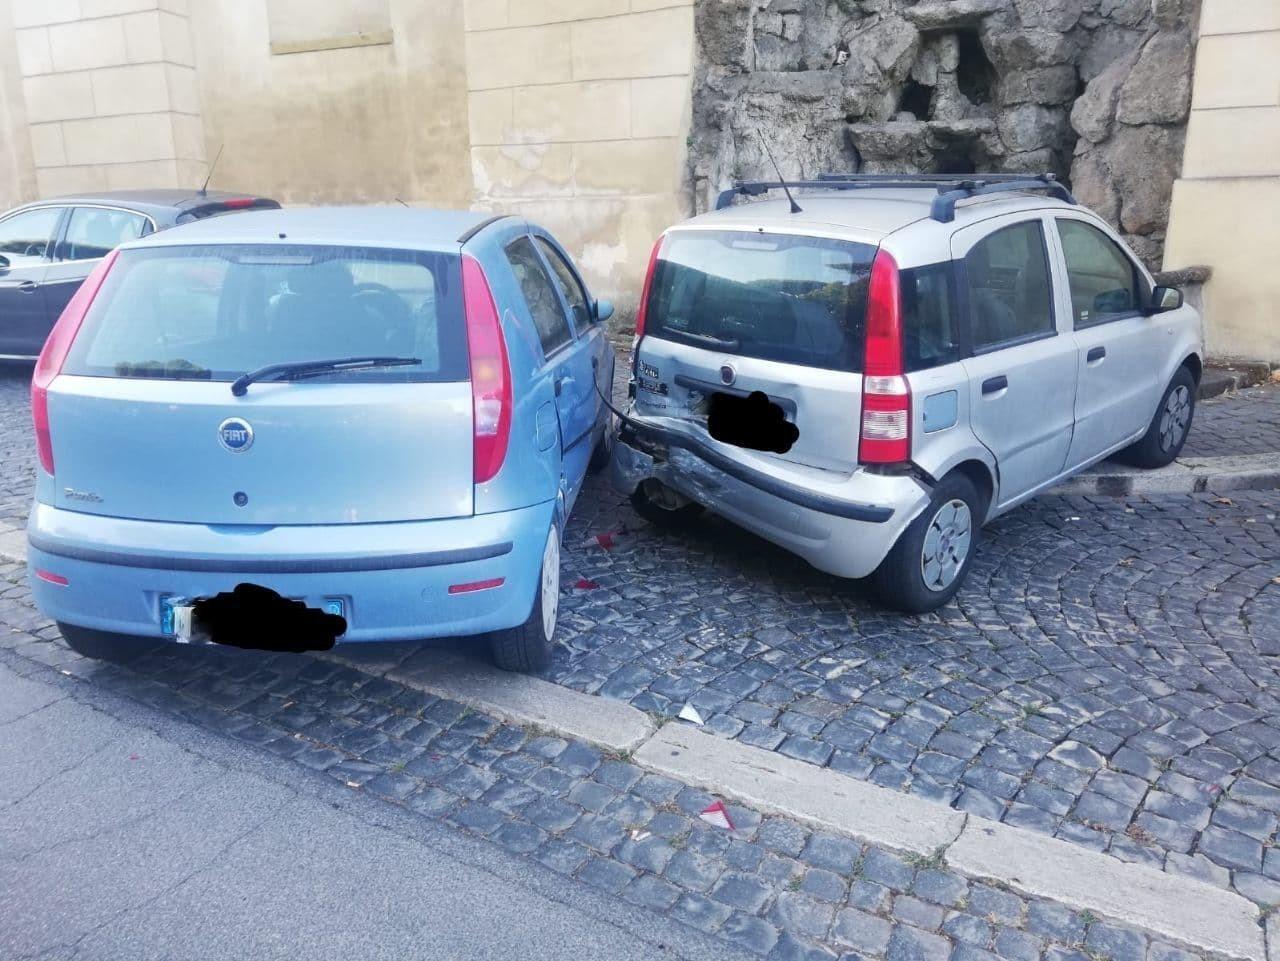 Frascati, urta violentemente due auto in sosta e se ne torna tranquillamente a casa